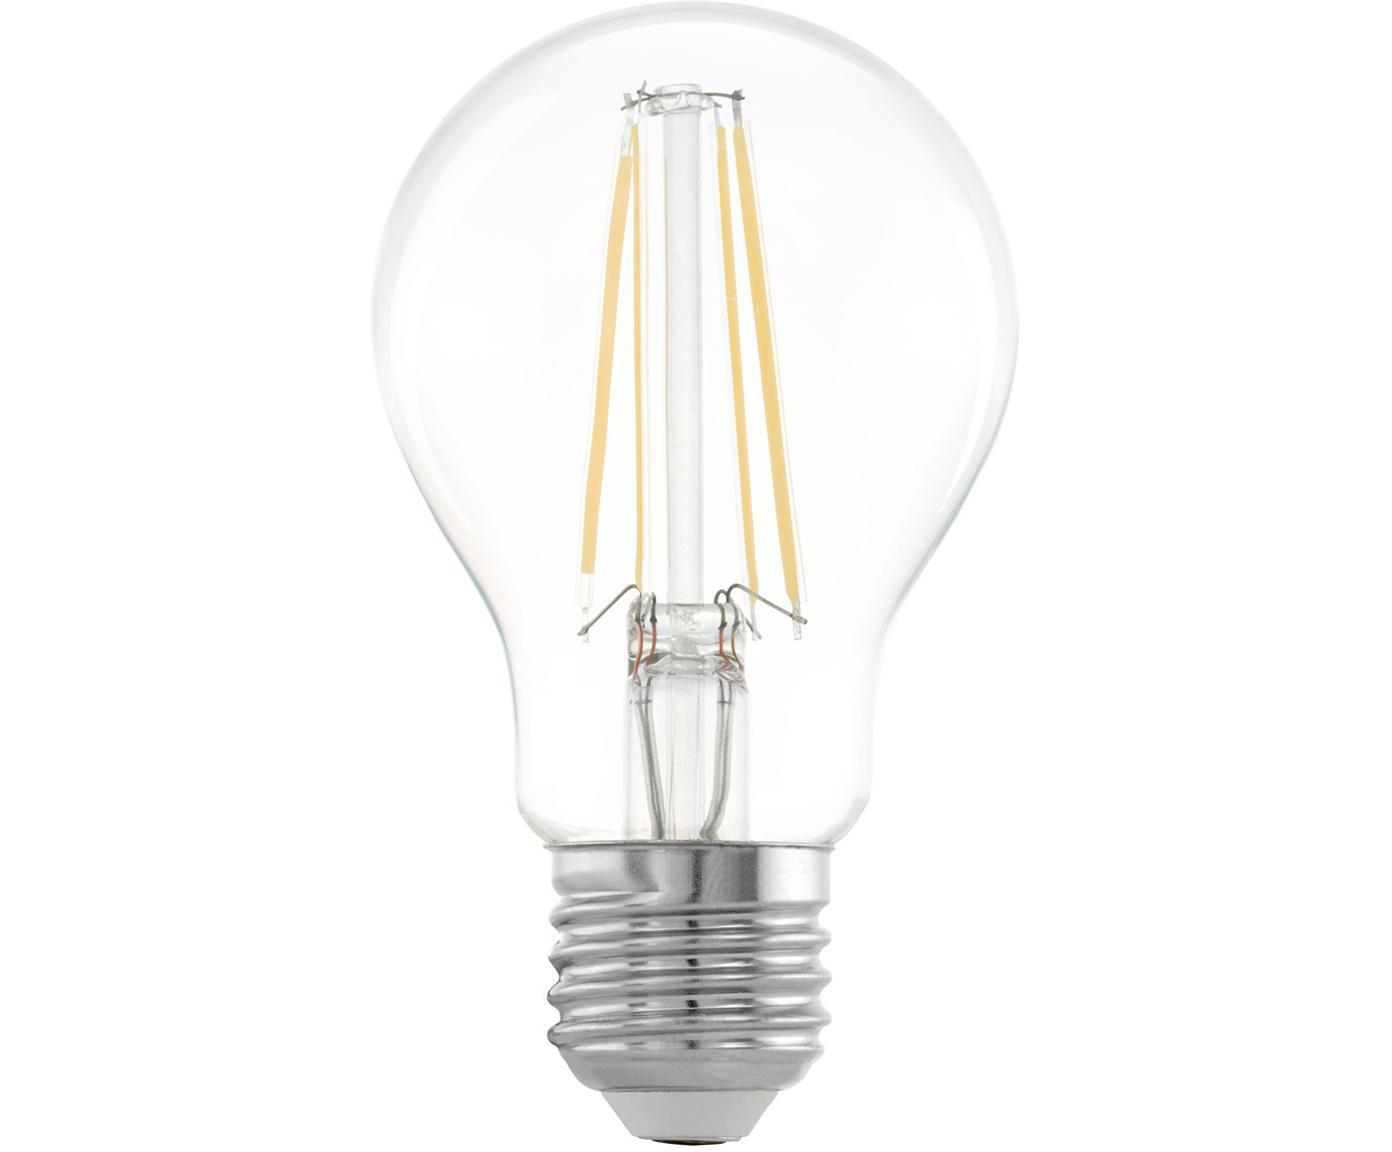 LED Leuchtmittel Cord (E27/6W), 5 Stück, Leuchtmittelschirm: Glas, Leuchtmittelfassung: Aluminium, Transparent, Ø 6 x H 10 cm